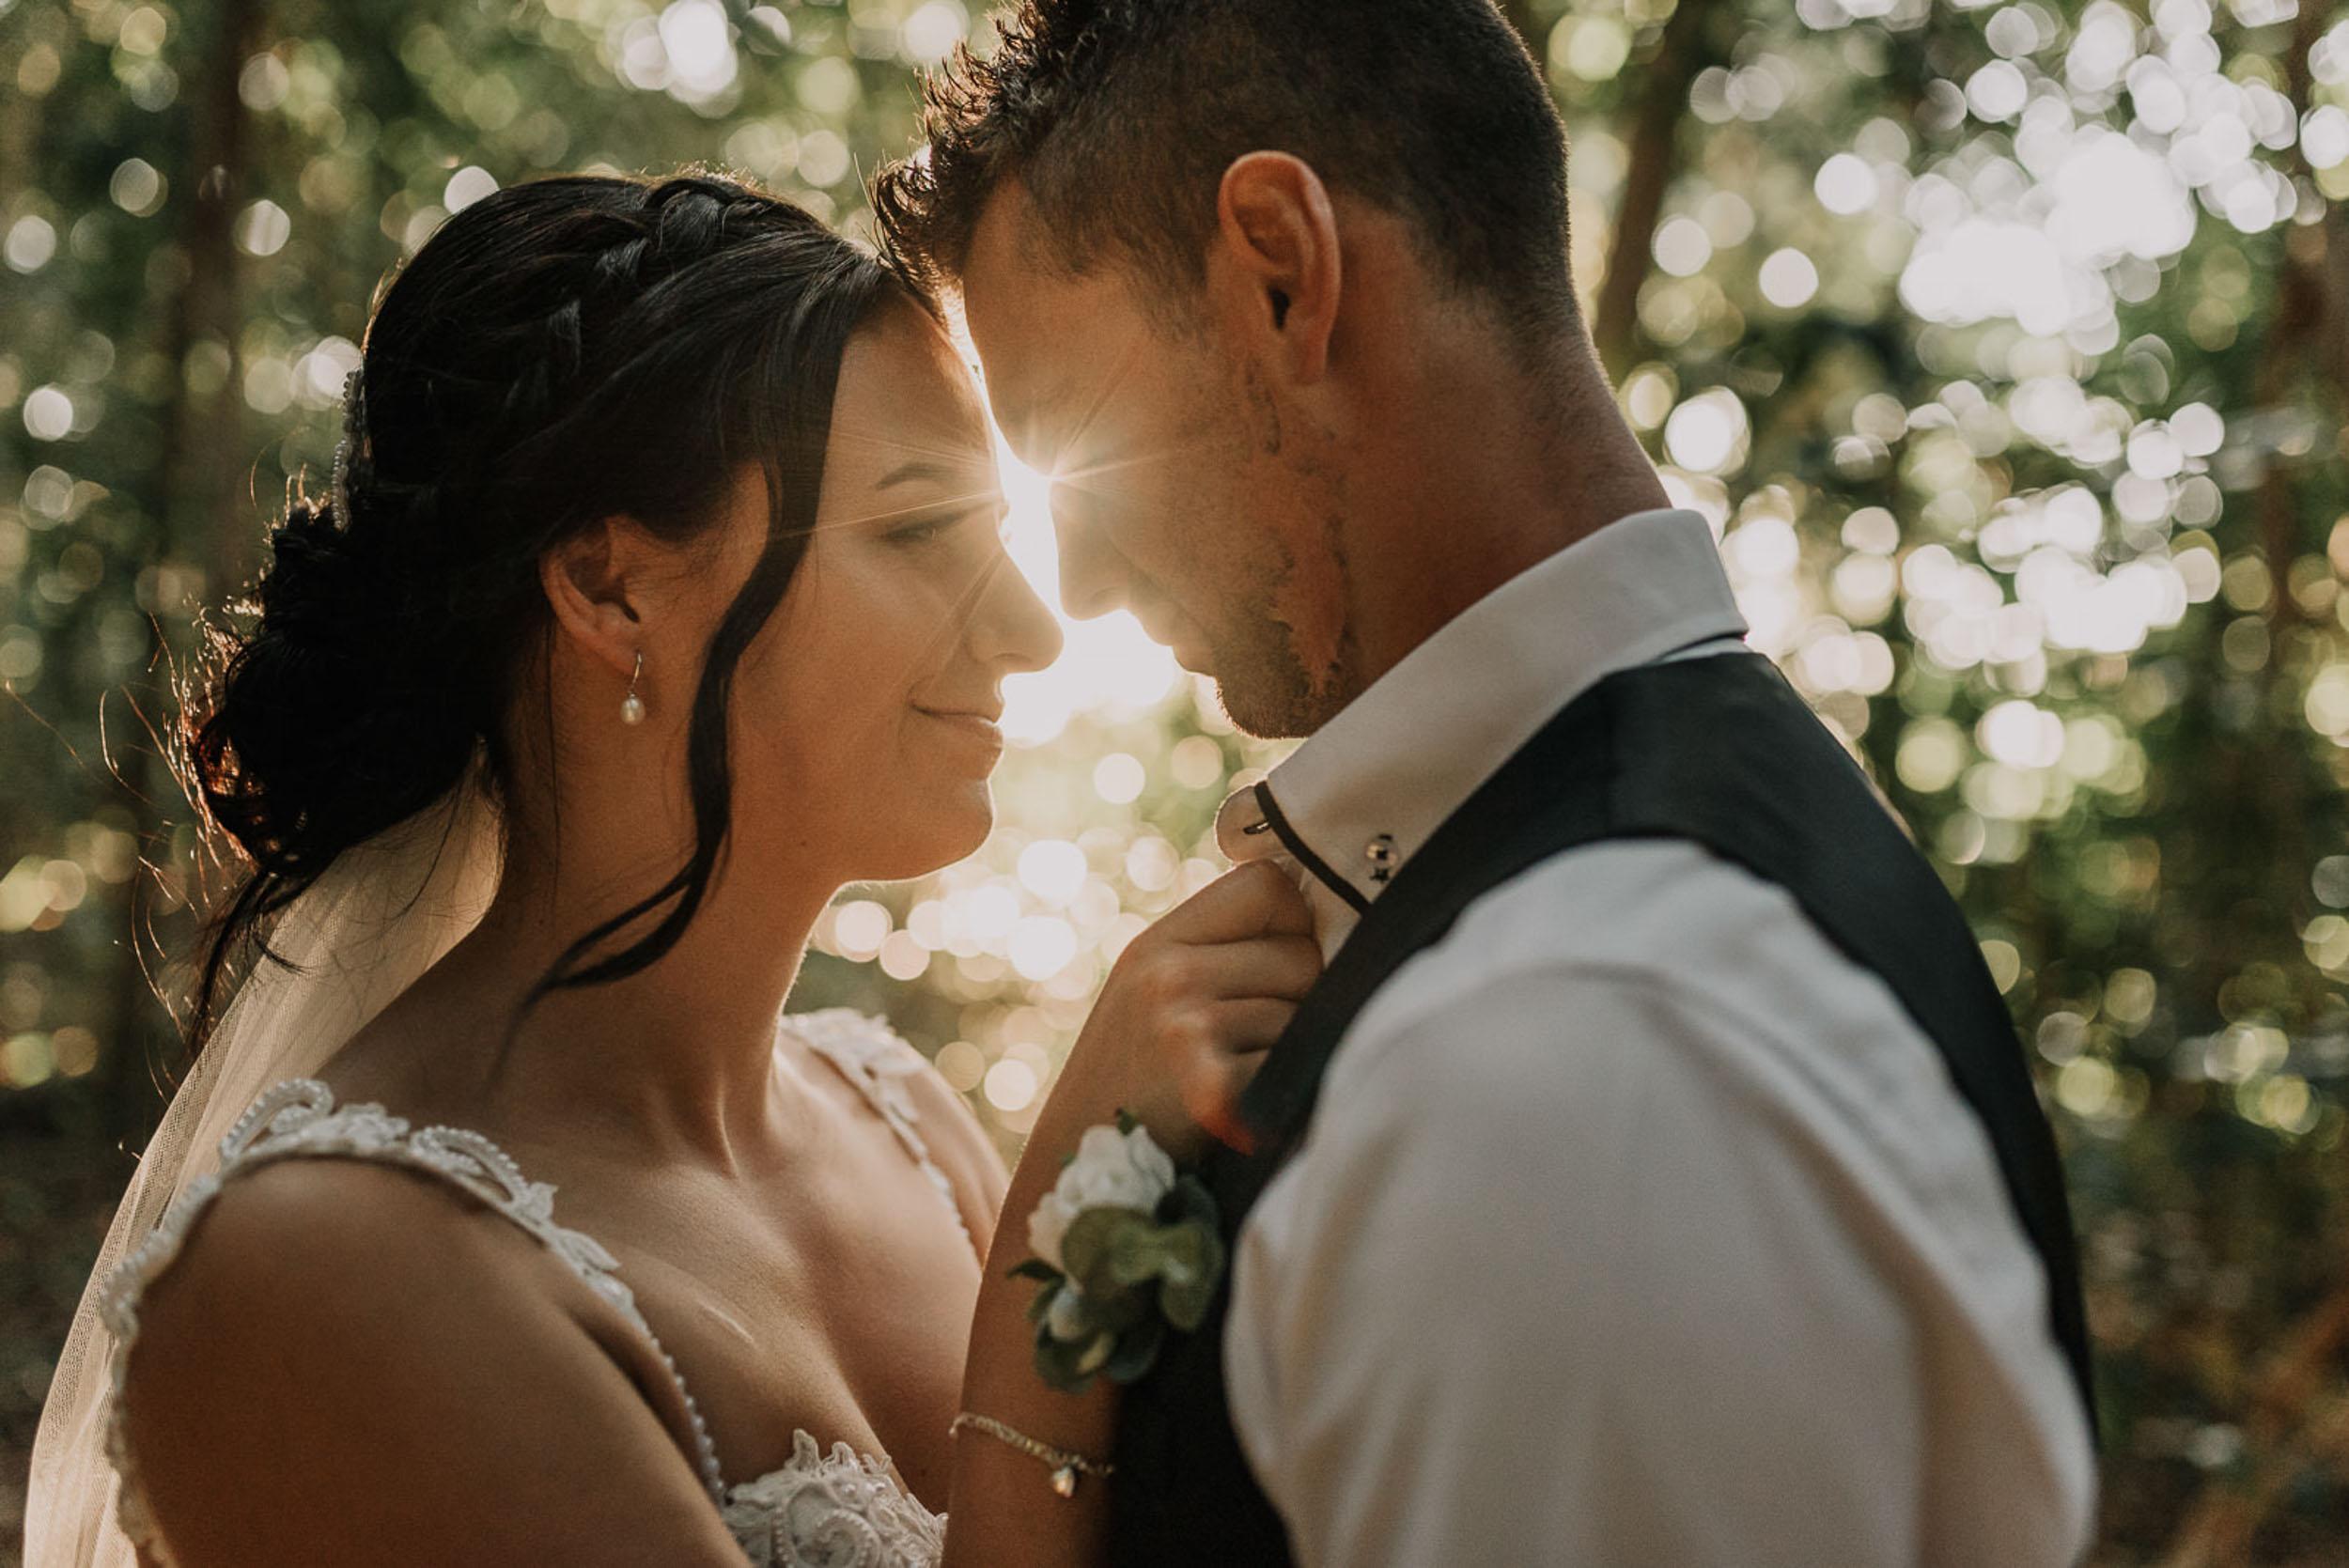 The Raw Photographer - Cairns Wedding Photographer - Fitzroy Island - Destination Wedding - Bride Dress - Groom Portrait - Queensland-29.jpg